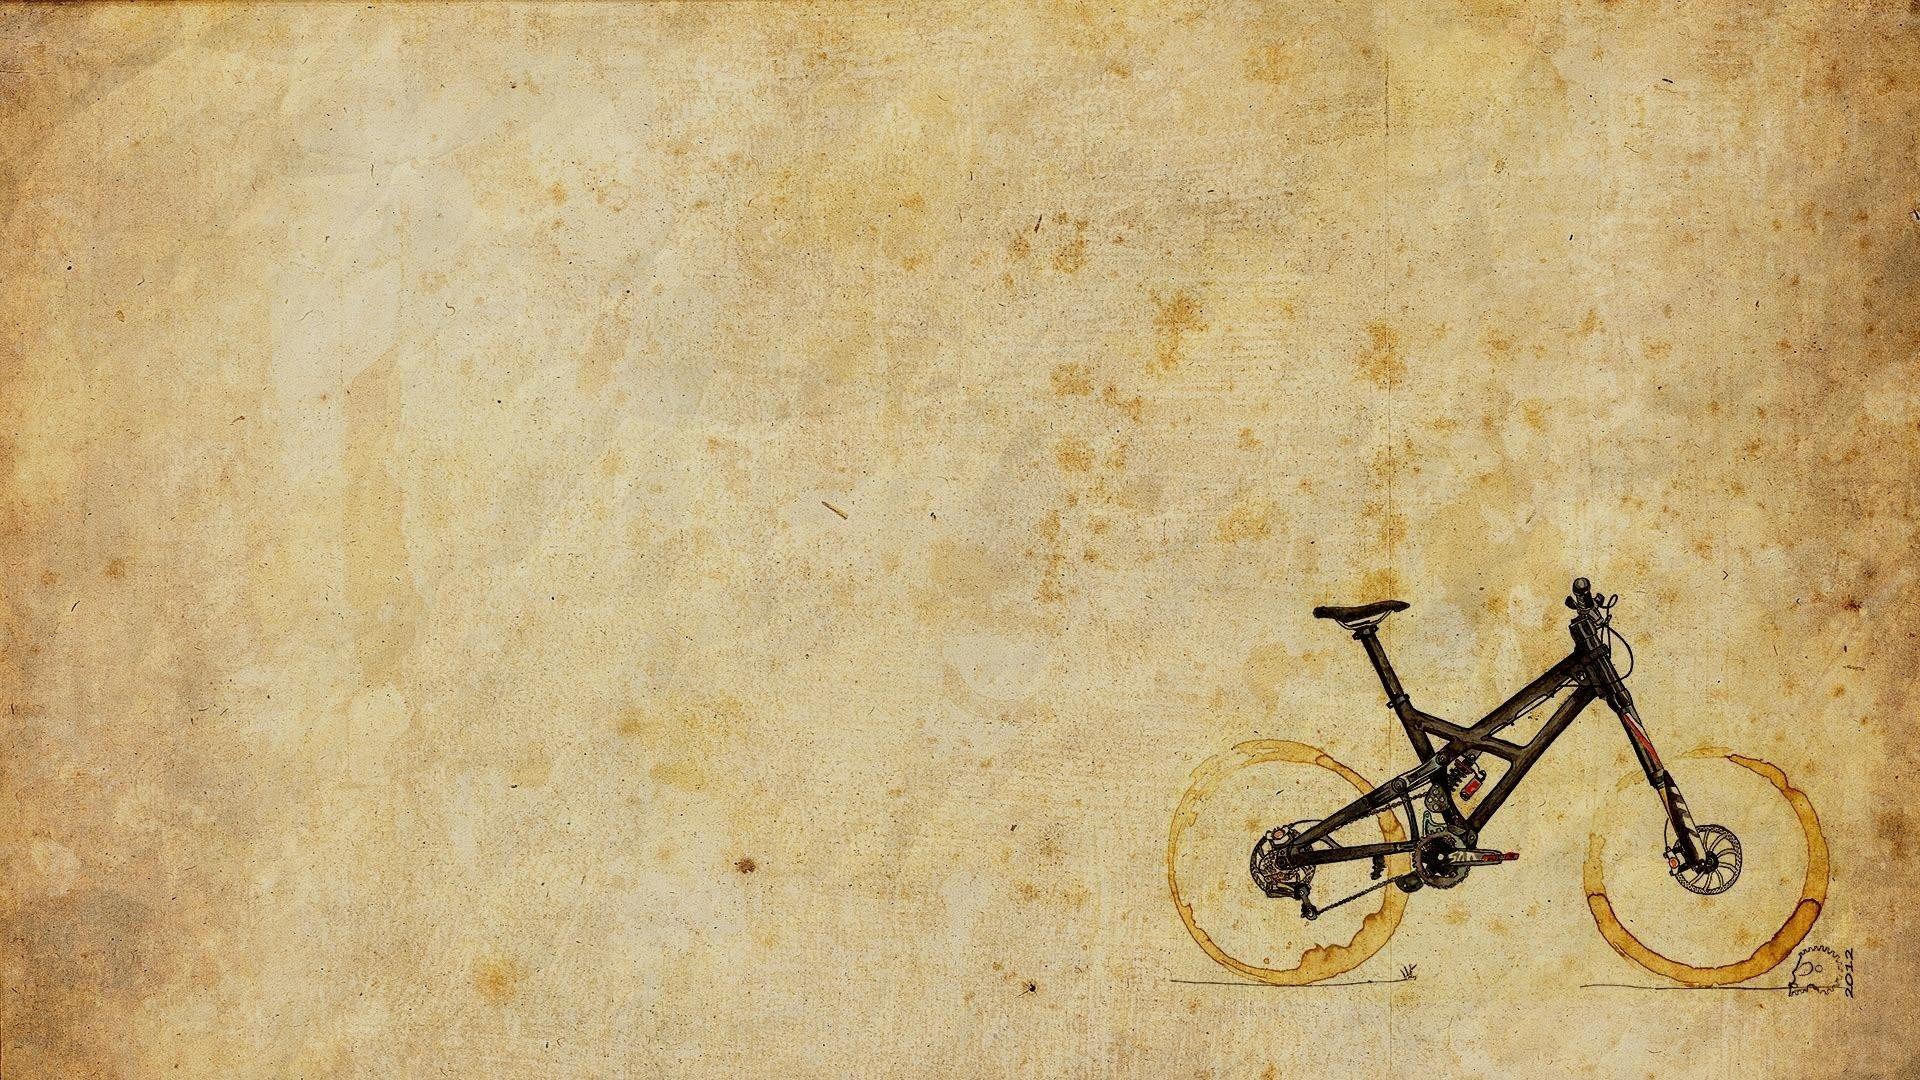 two-cups-coffee-stains-mountain-bike-art-hd-wallpaper.jpg (1920×1080 ...